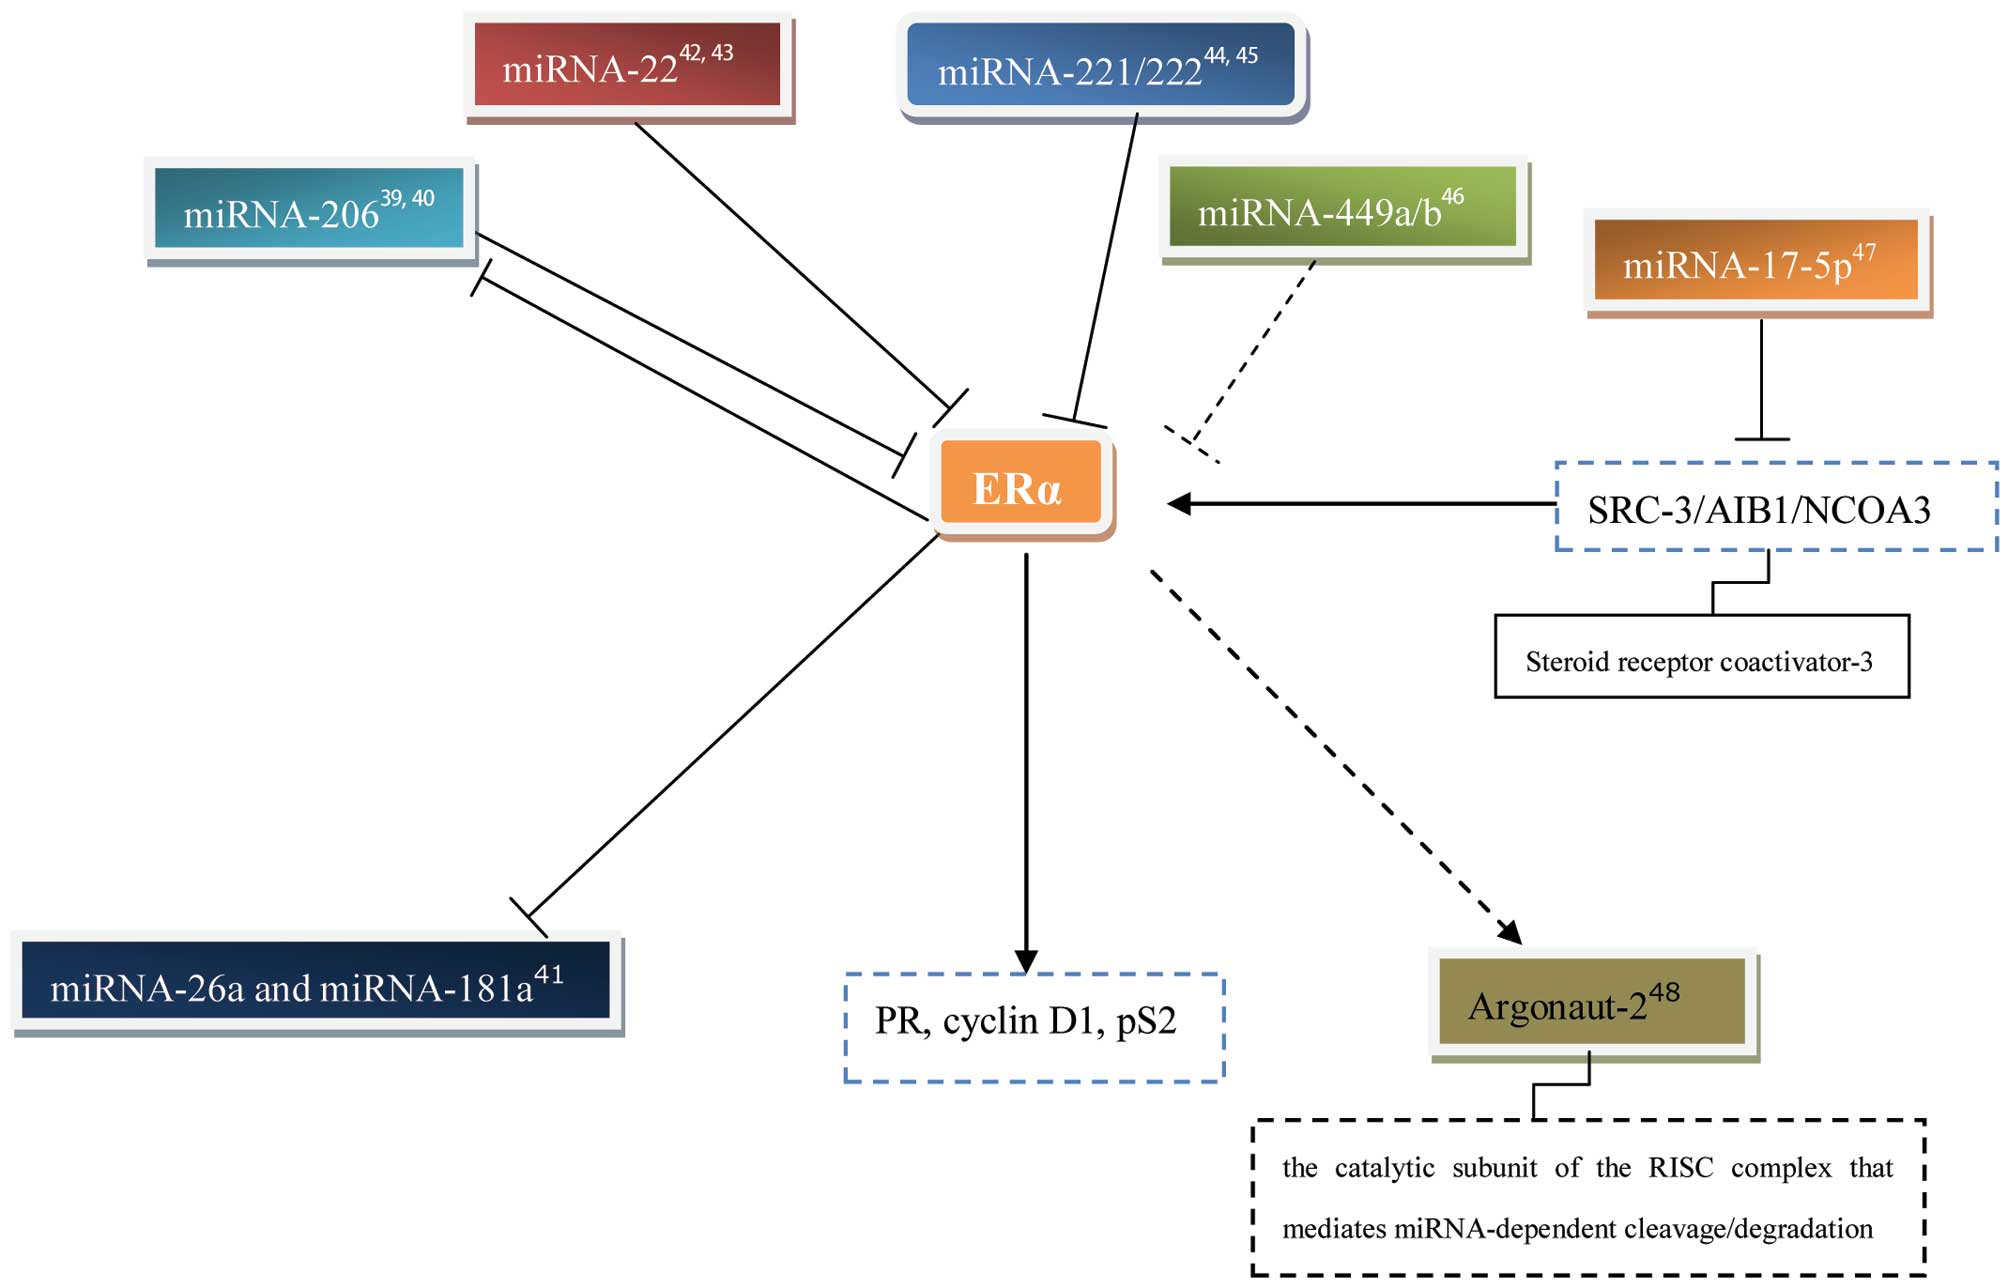 Tamoxifen resistance in breast cancer elucidating mechanisms of evolution